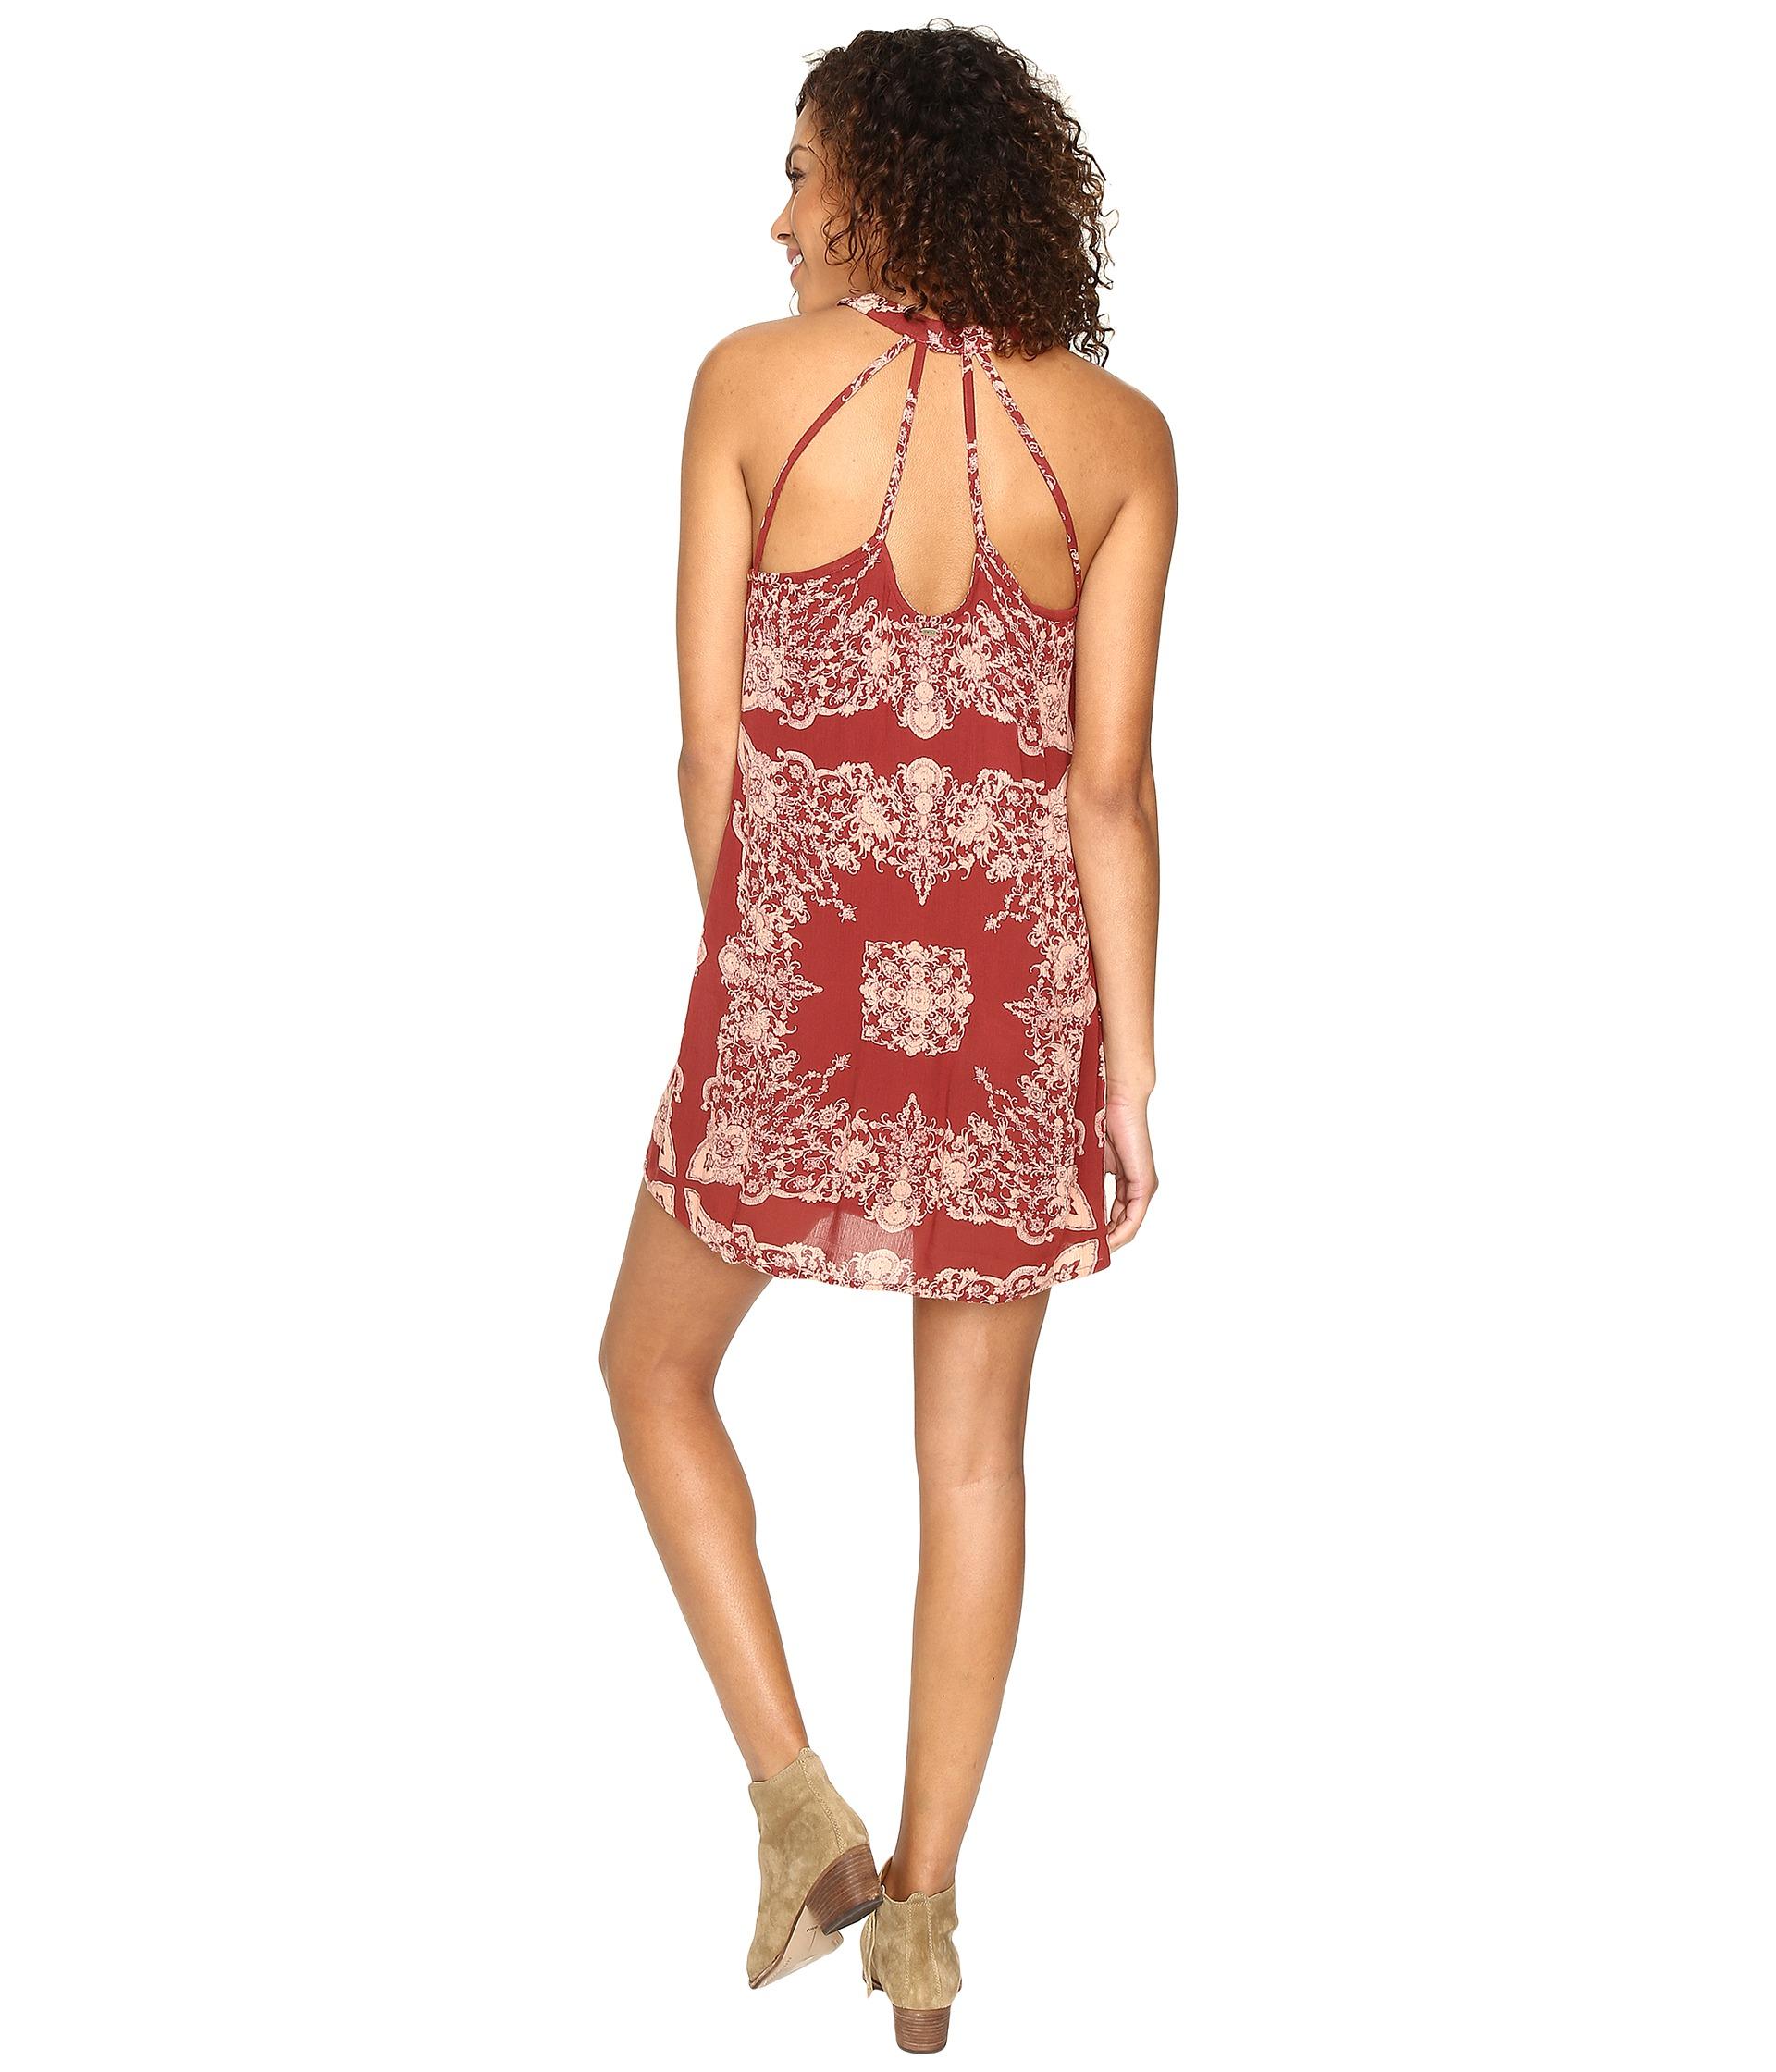 O neill summer dresses 00